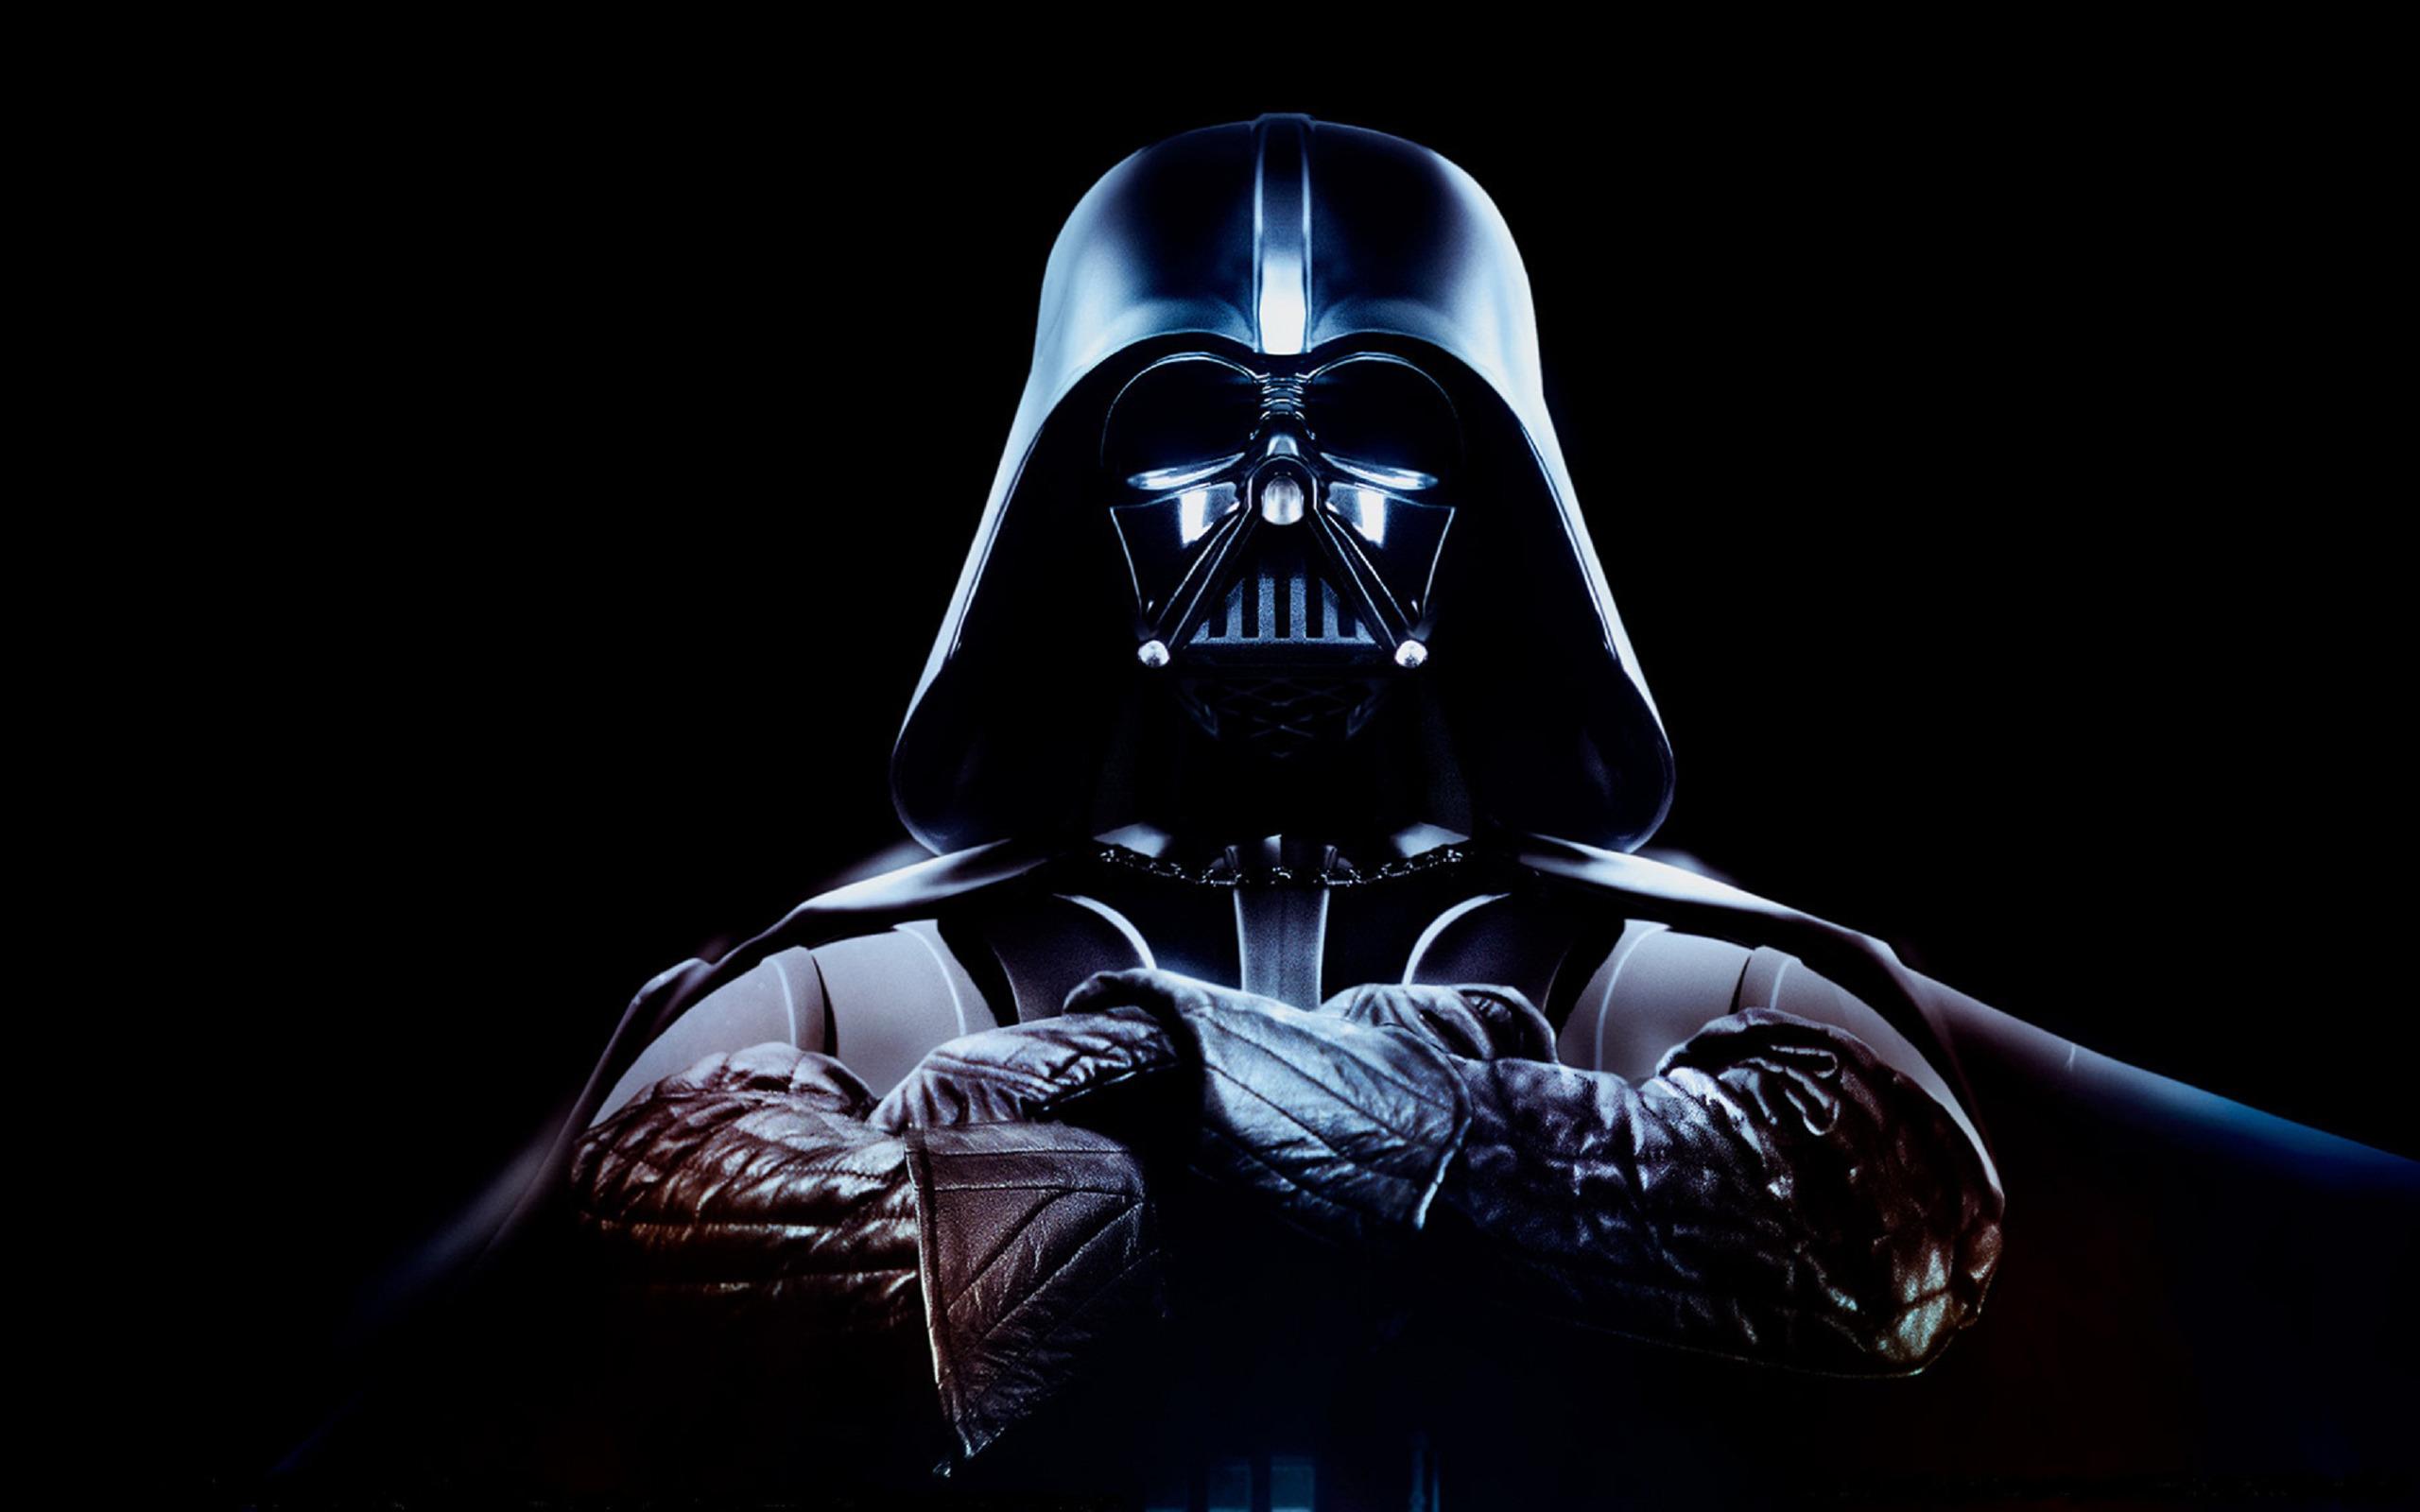 Fotos 360 del casco Darth Vader (II) #VidePan #FacetheForce #StarWars #Madrid